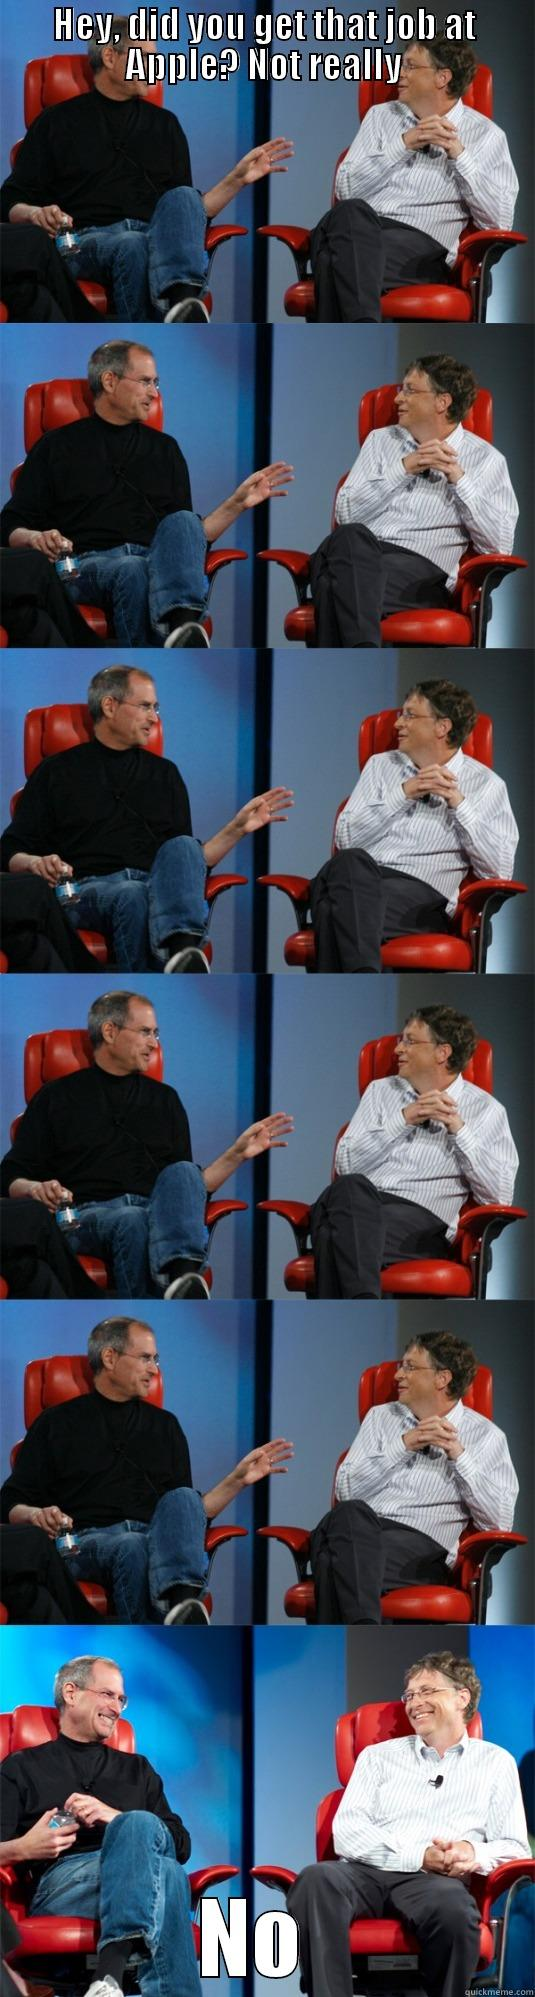 Joly Job Jamboree - HEY, DID YOU GET THAT JOB AT APPLE? NOT REALLY NO  Steve Jobs vs Bill Gates